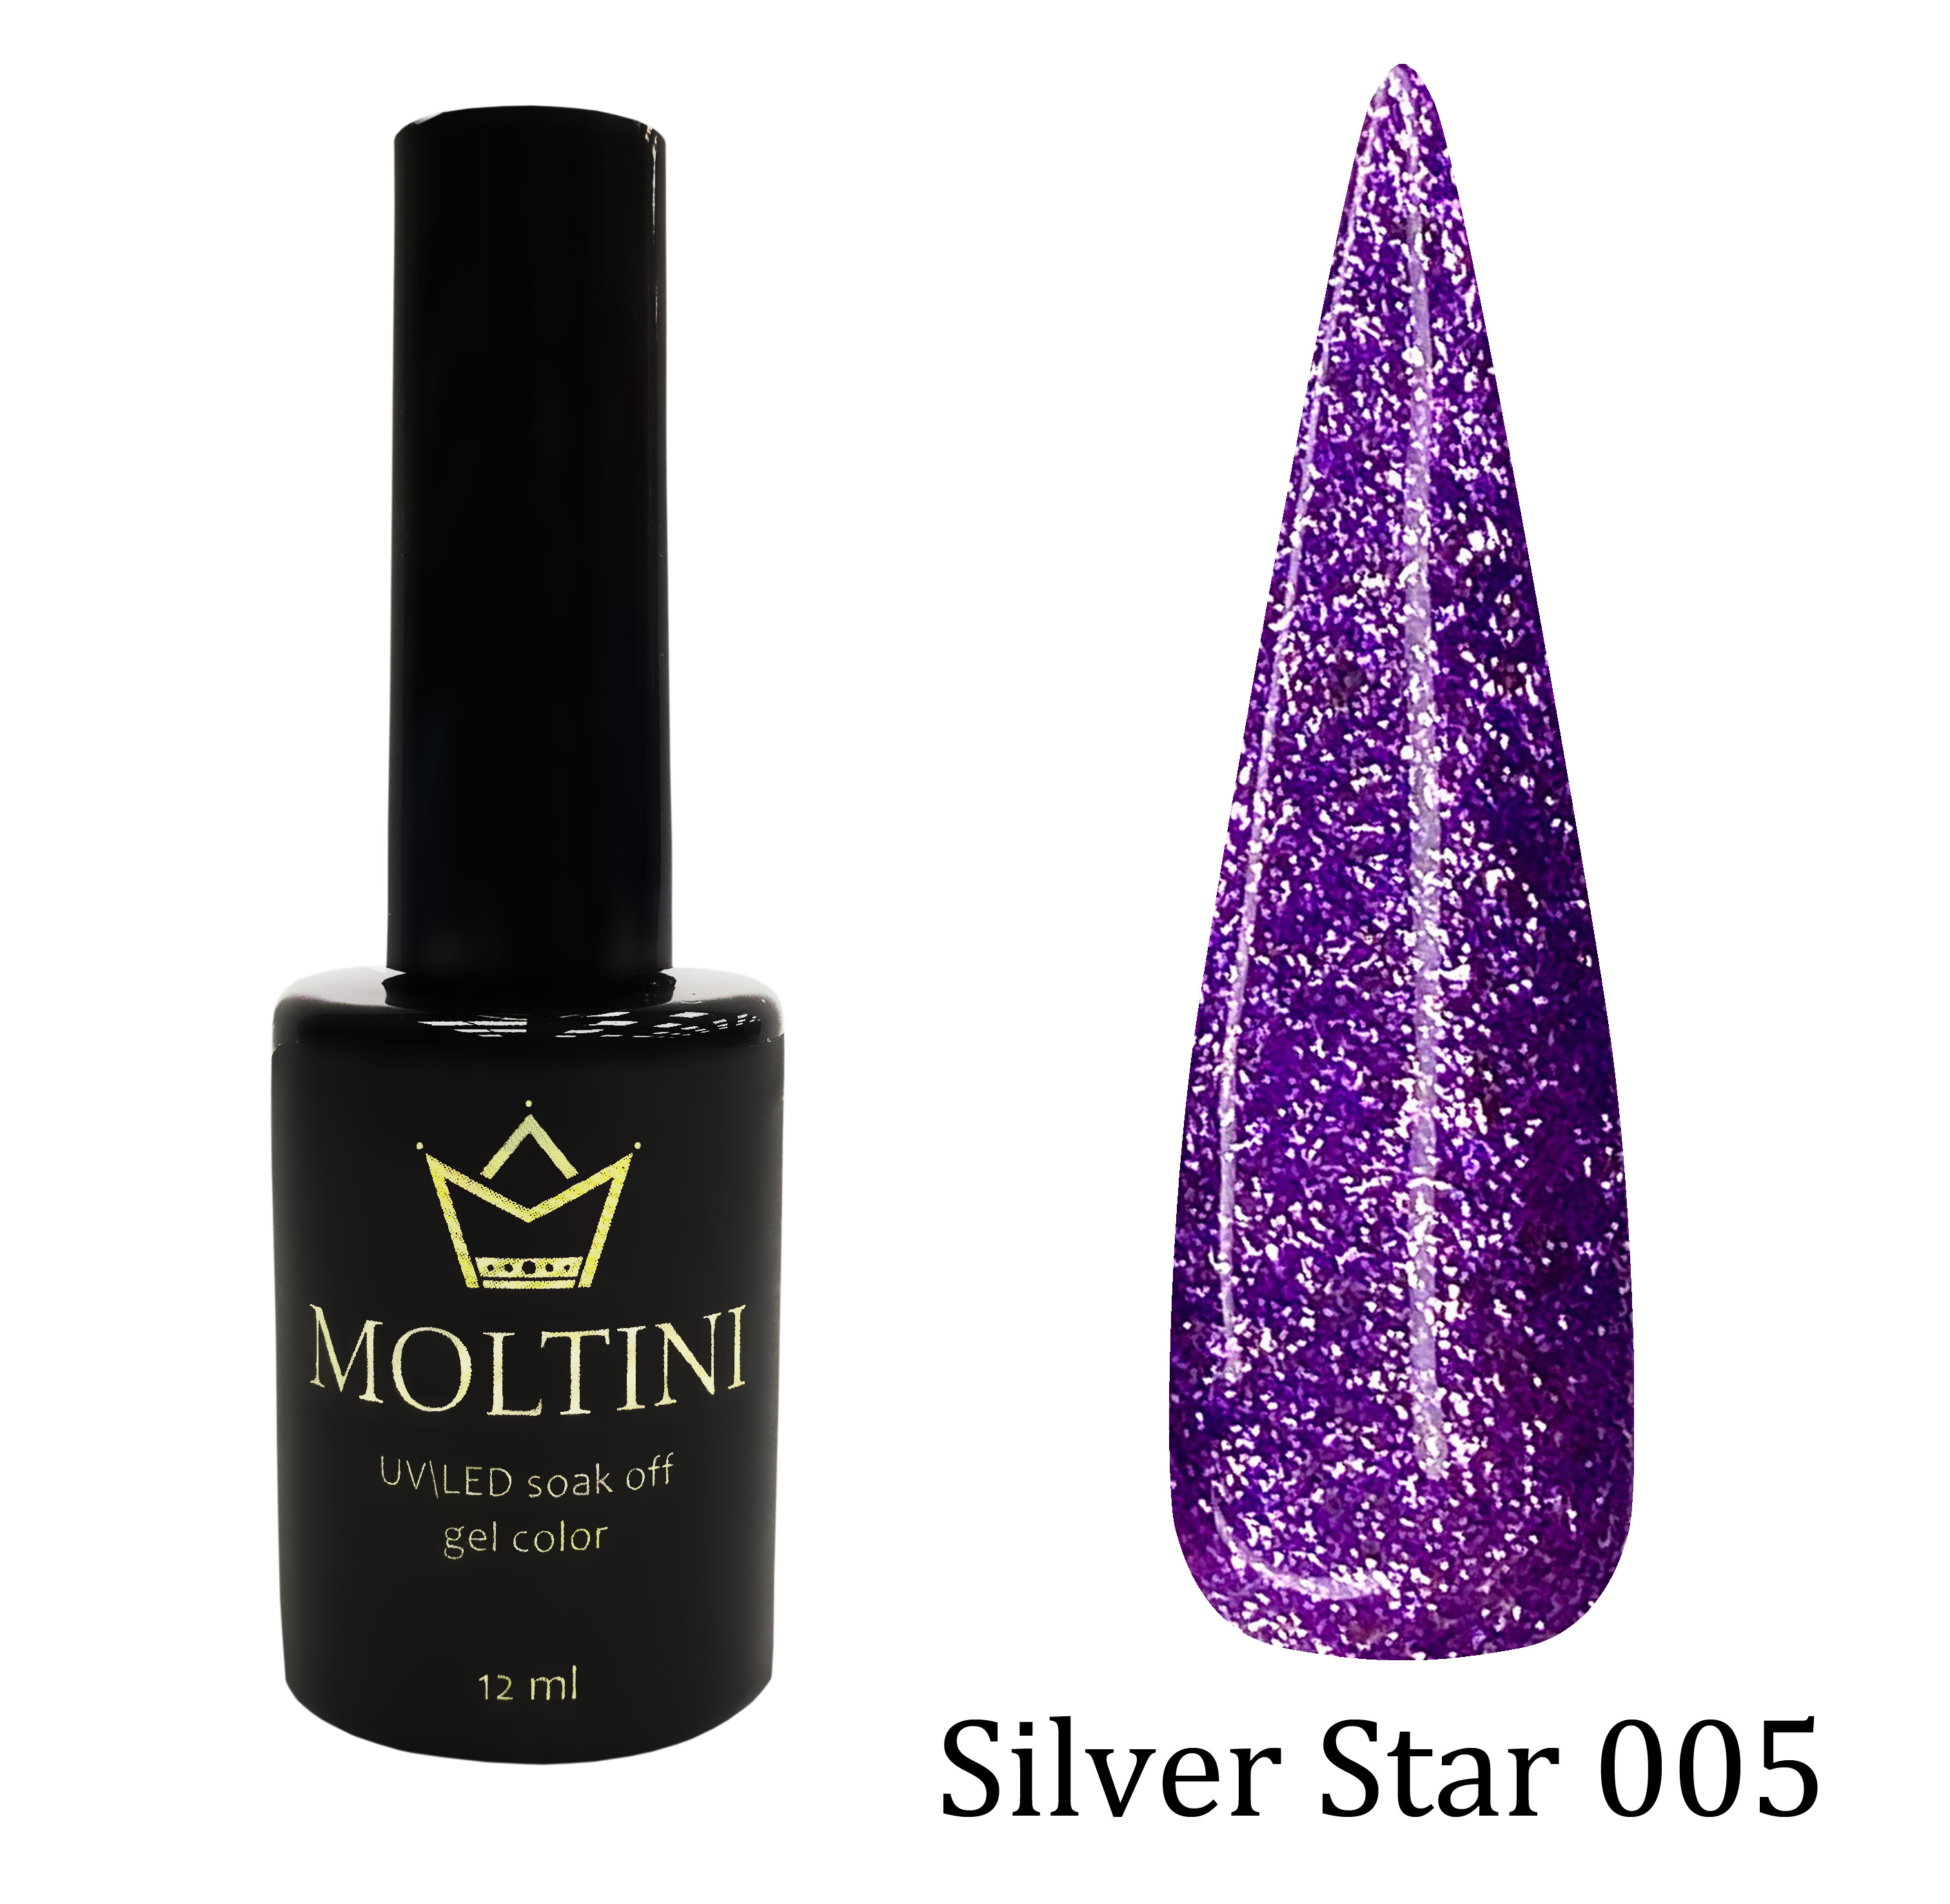 Гель-лак Moltini Silver Star 005, 12 ml